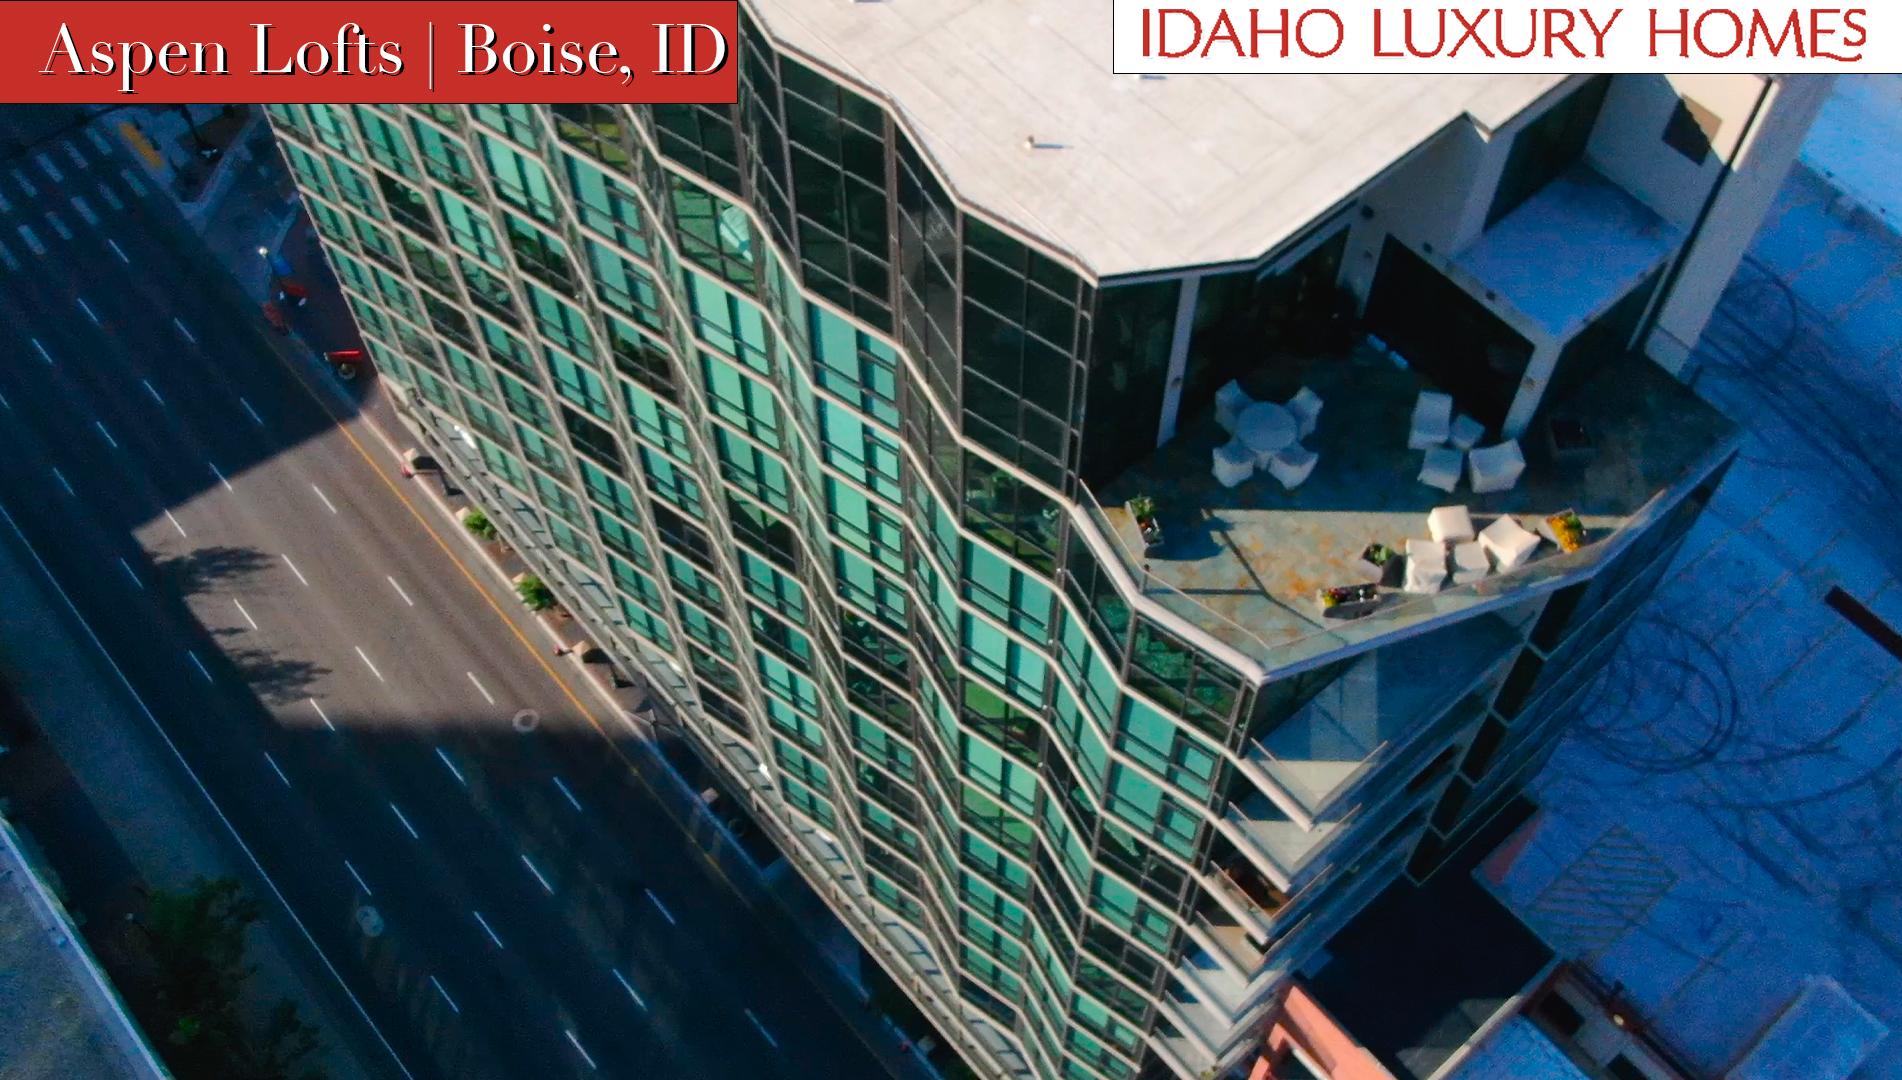 Aspen Lofts Real Estate